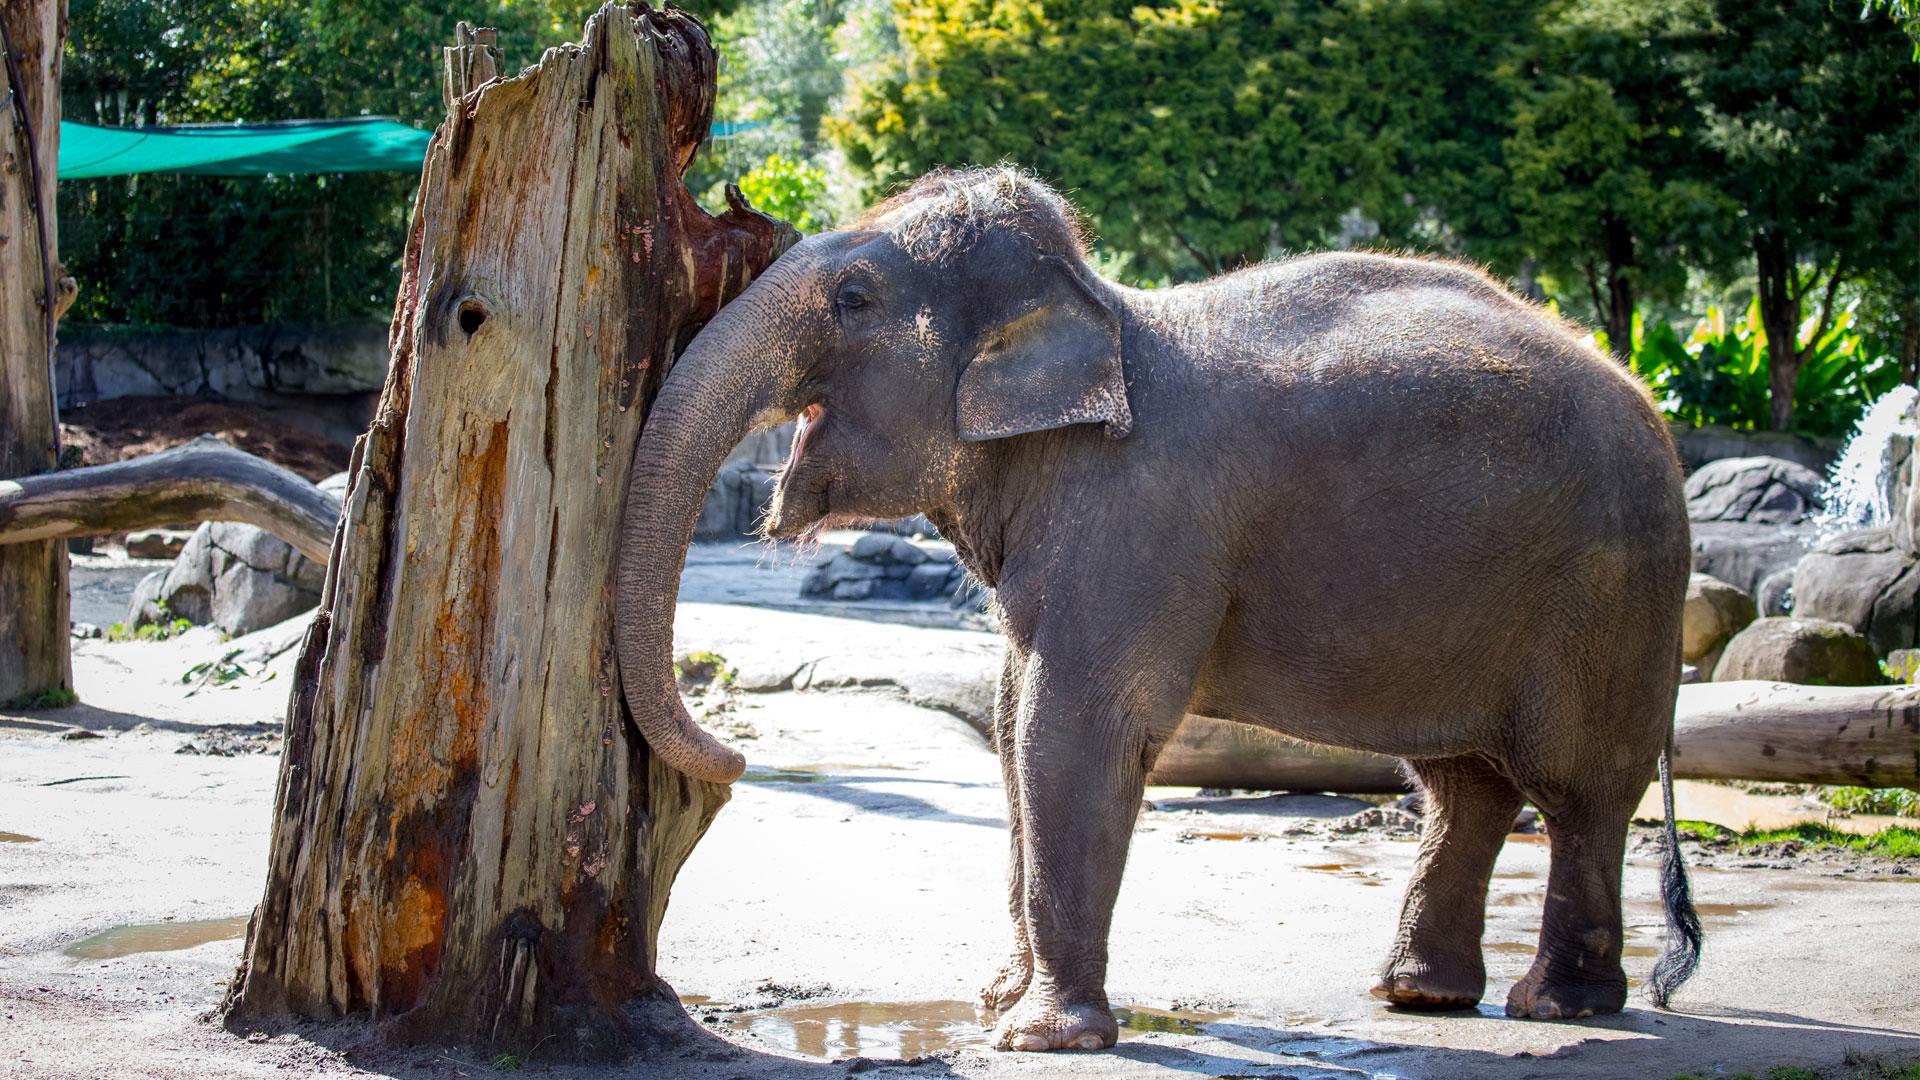 https://rfacdn.nz/zoo/assets/media/elephant-news-gallery-15.jpg